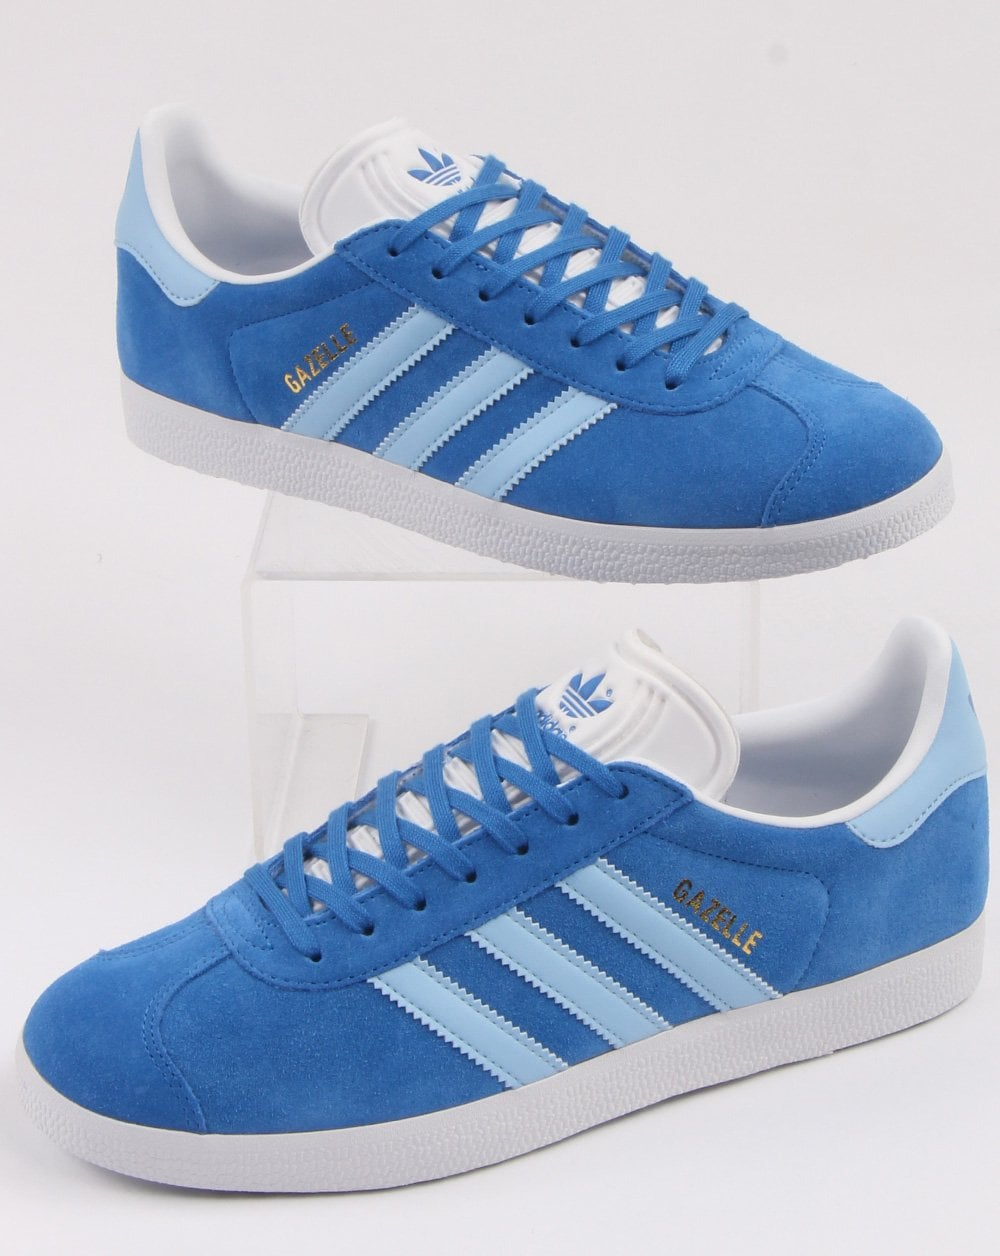 size 40 bb2b1 d920c adidas Trainers Adidas Gazelle Trainers True Blue Sky